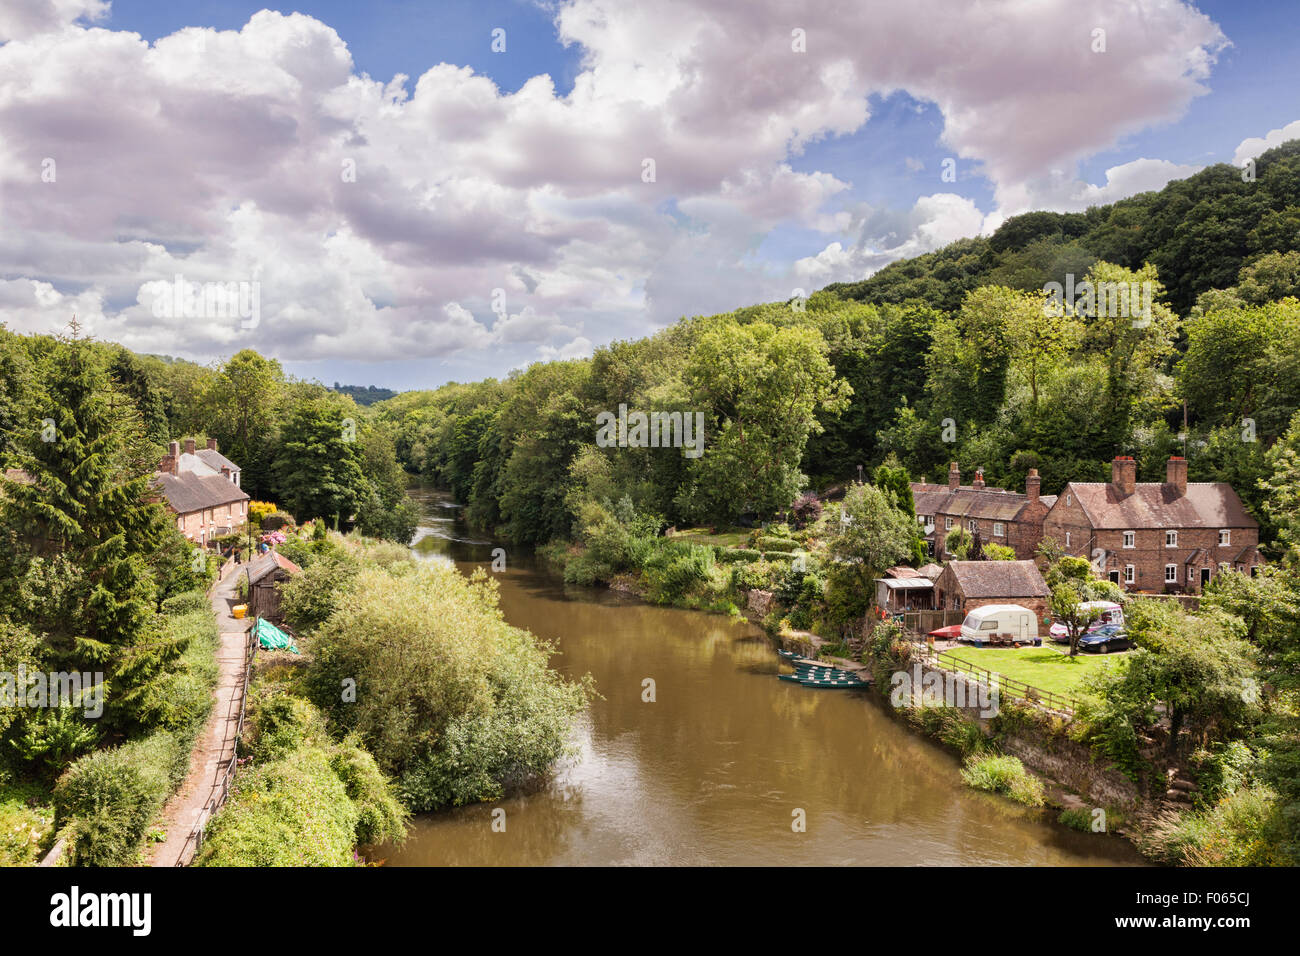 The River Severn at Ironbridge, Shropshire, England - Stock Image